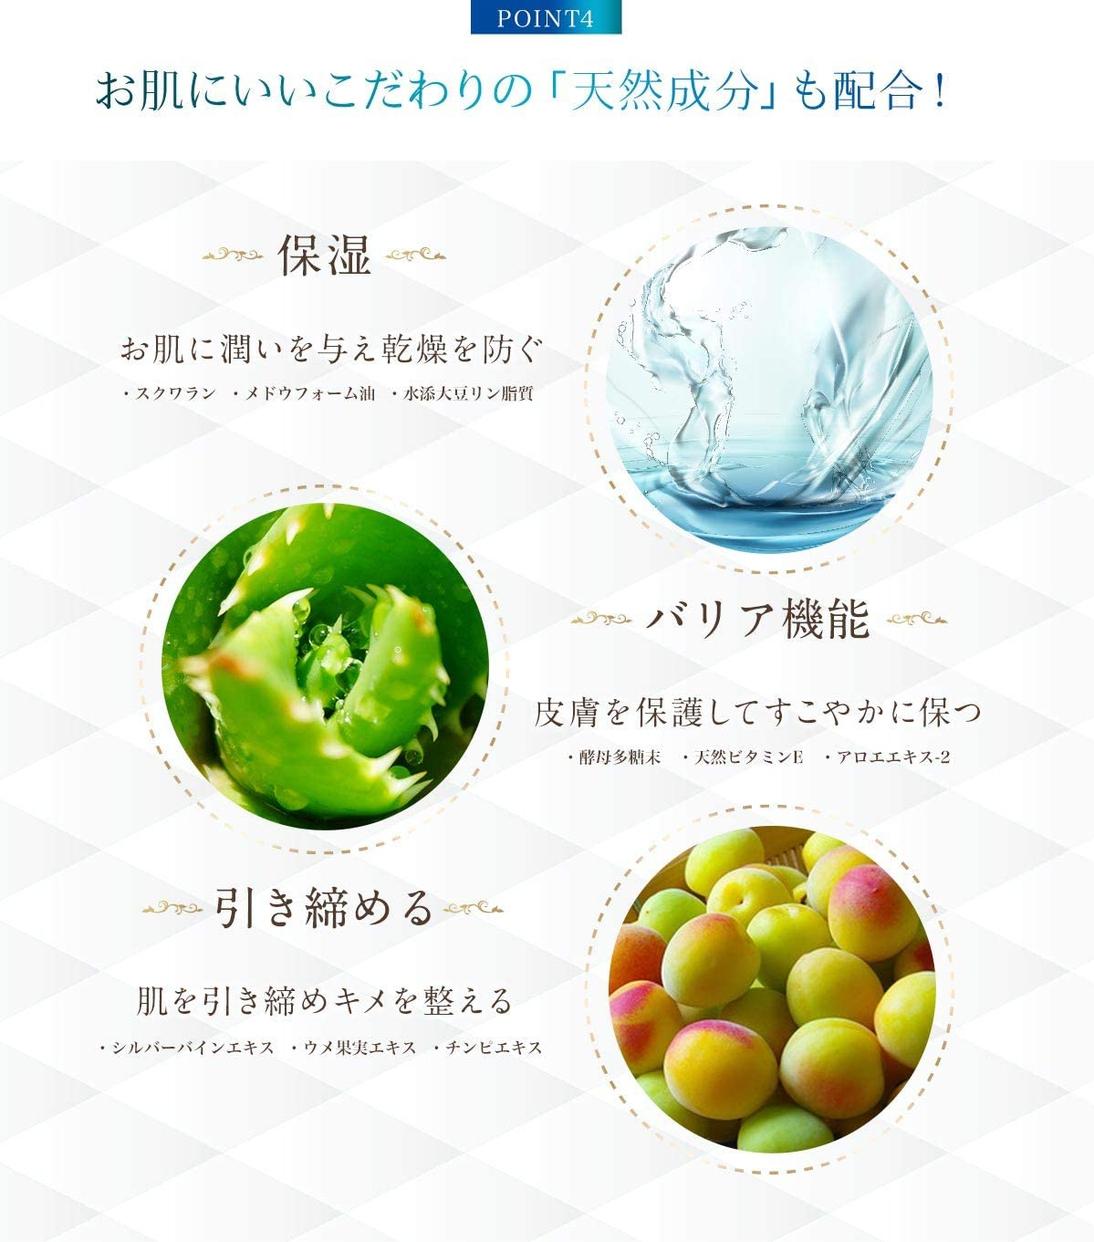 WHIPURE(ホワイピュア) 薬用美白クリームの商品画像6